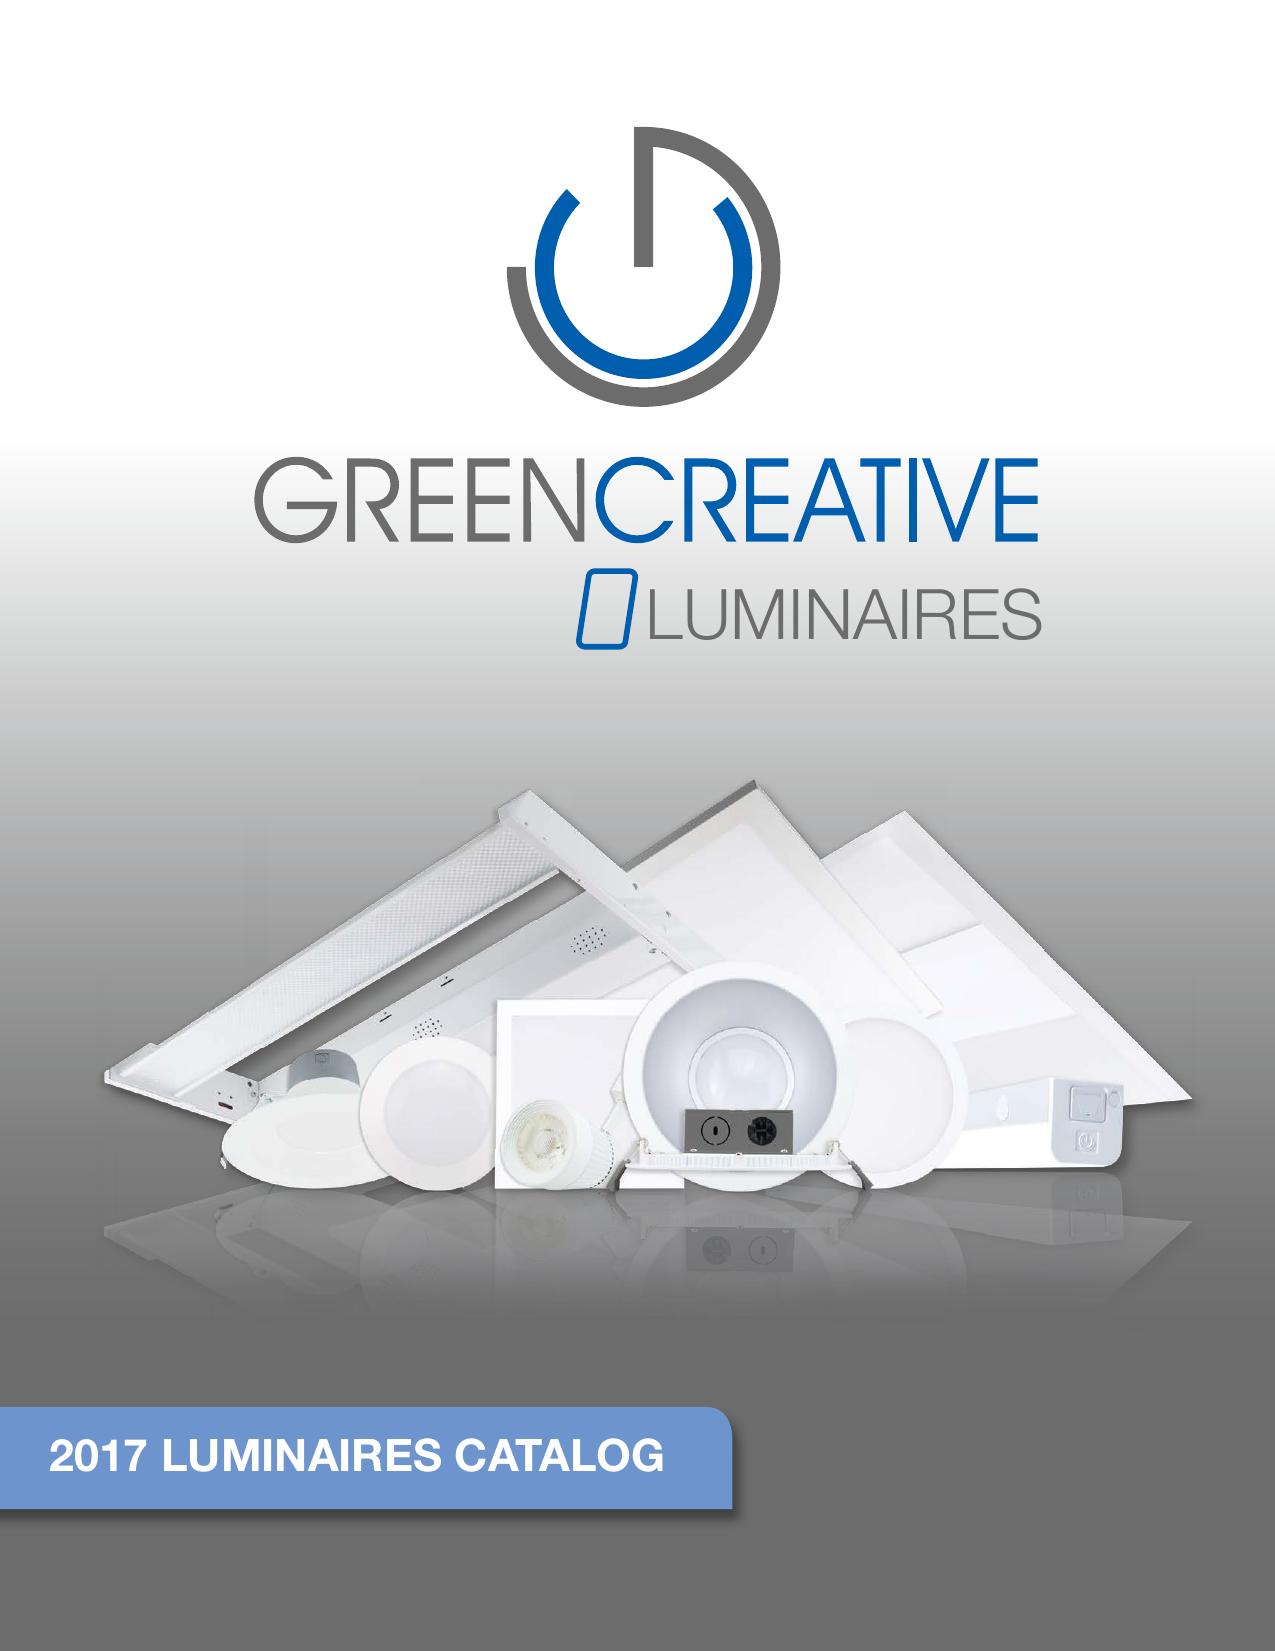 Dimmable 25W Green Creative 28339 2X2 Troffer DLC Premium 4000K Daylight White 3600 lm